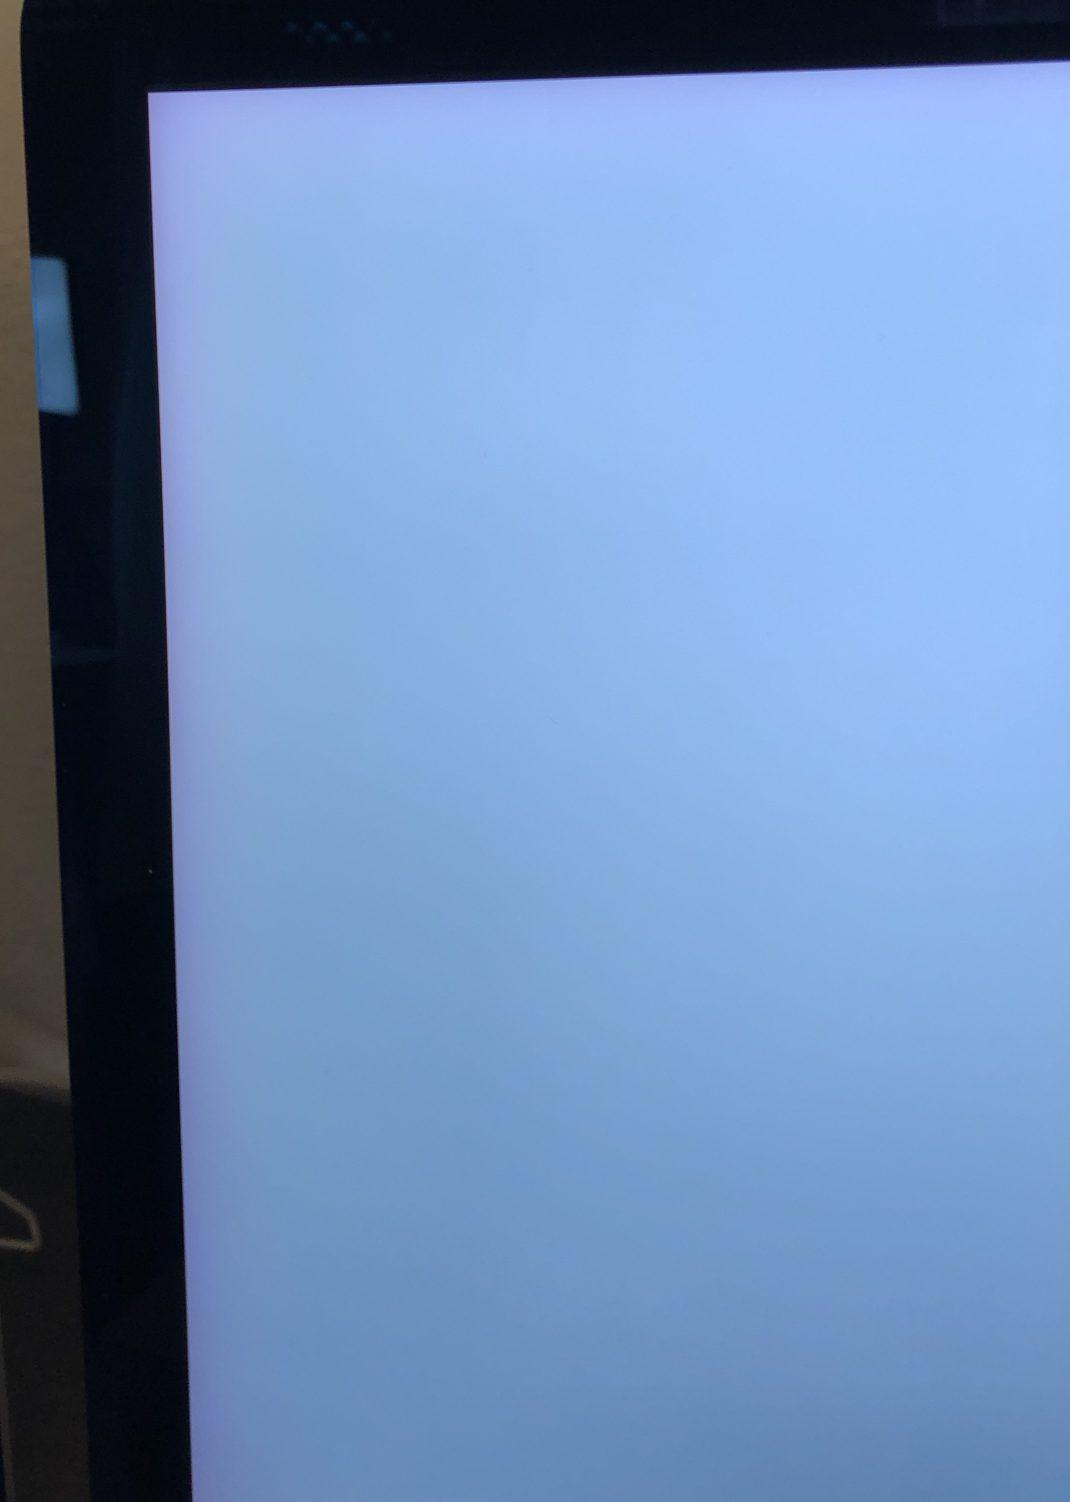 "iMac 27"" Retina 5K Late 2015 (Intel Quad-Core i7 4.0 GHz 32 GB RAM 3 TB Fusion Drive), Intel Quad-Core i7 4.0 GHz, 32 GB RAM, 3 TB Fusion Drive, Kuva 4"